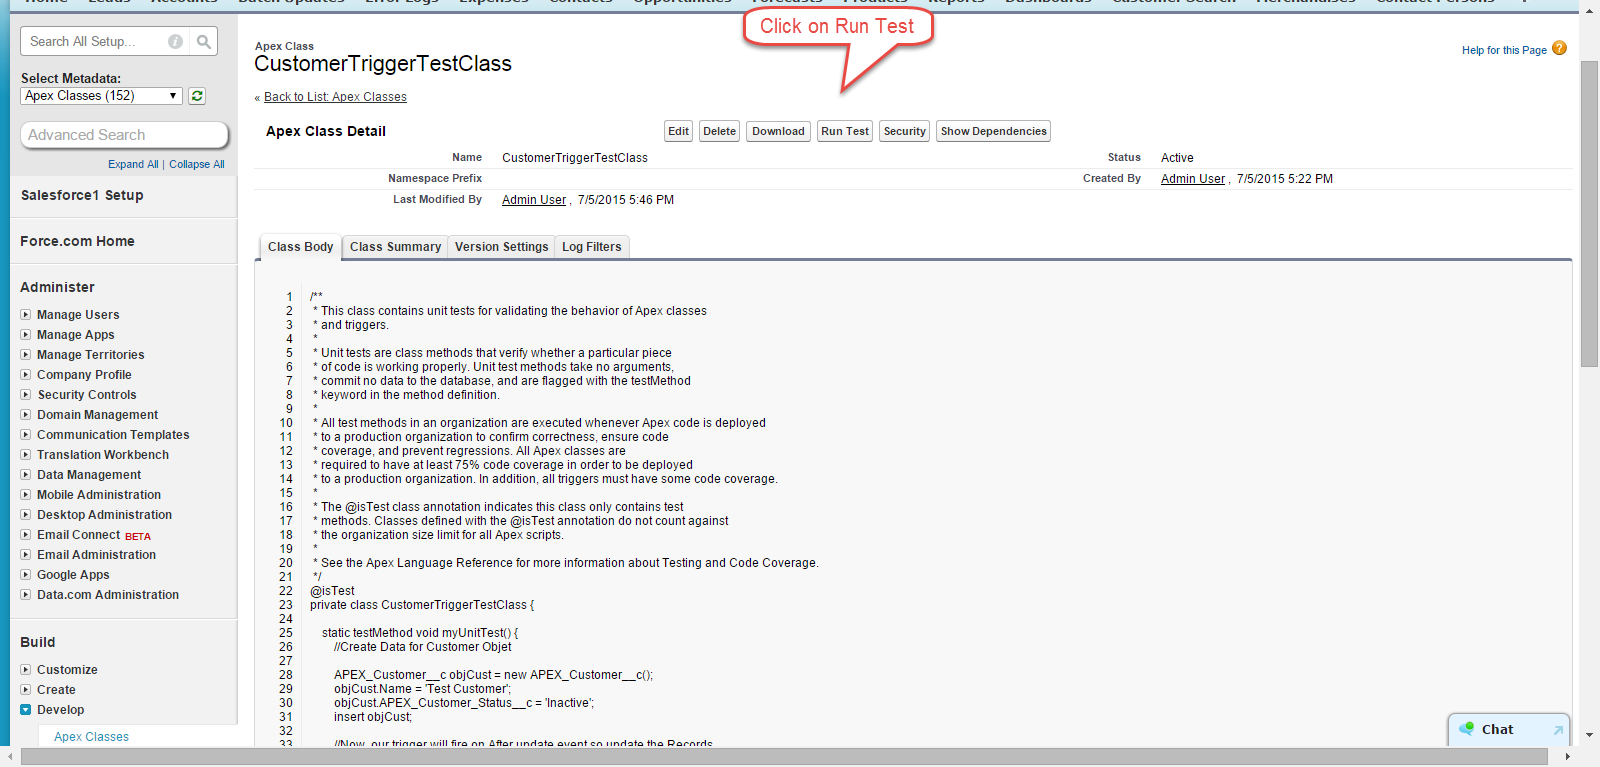 CustomerTriggerTestClass